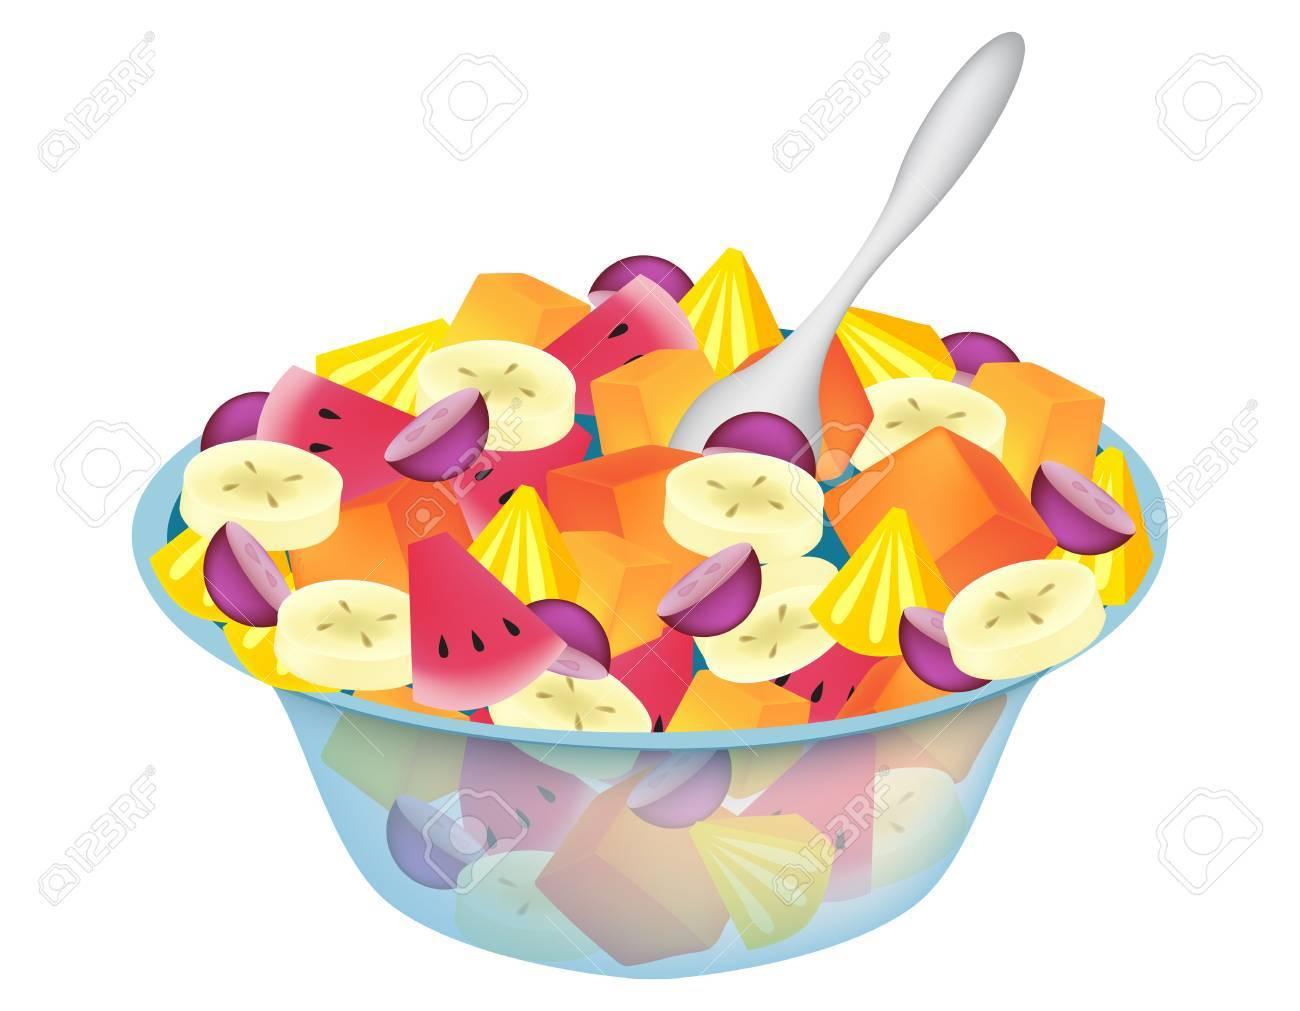 Clipart fruit salad png freeuse Fruit Salad Clipart - Making-The-Web.com png freeuse